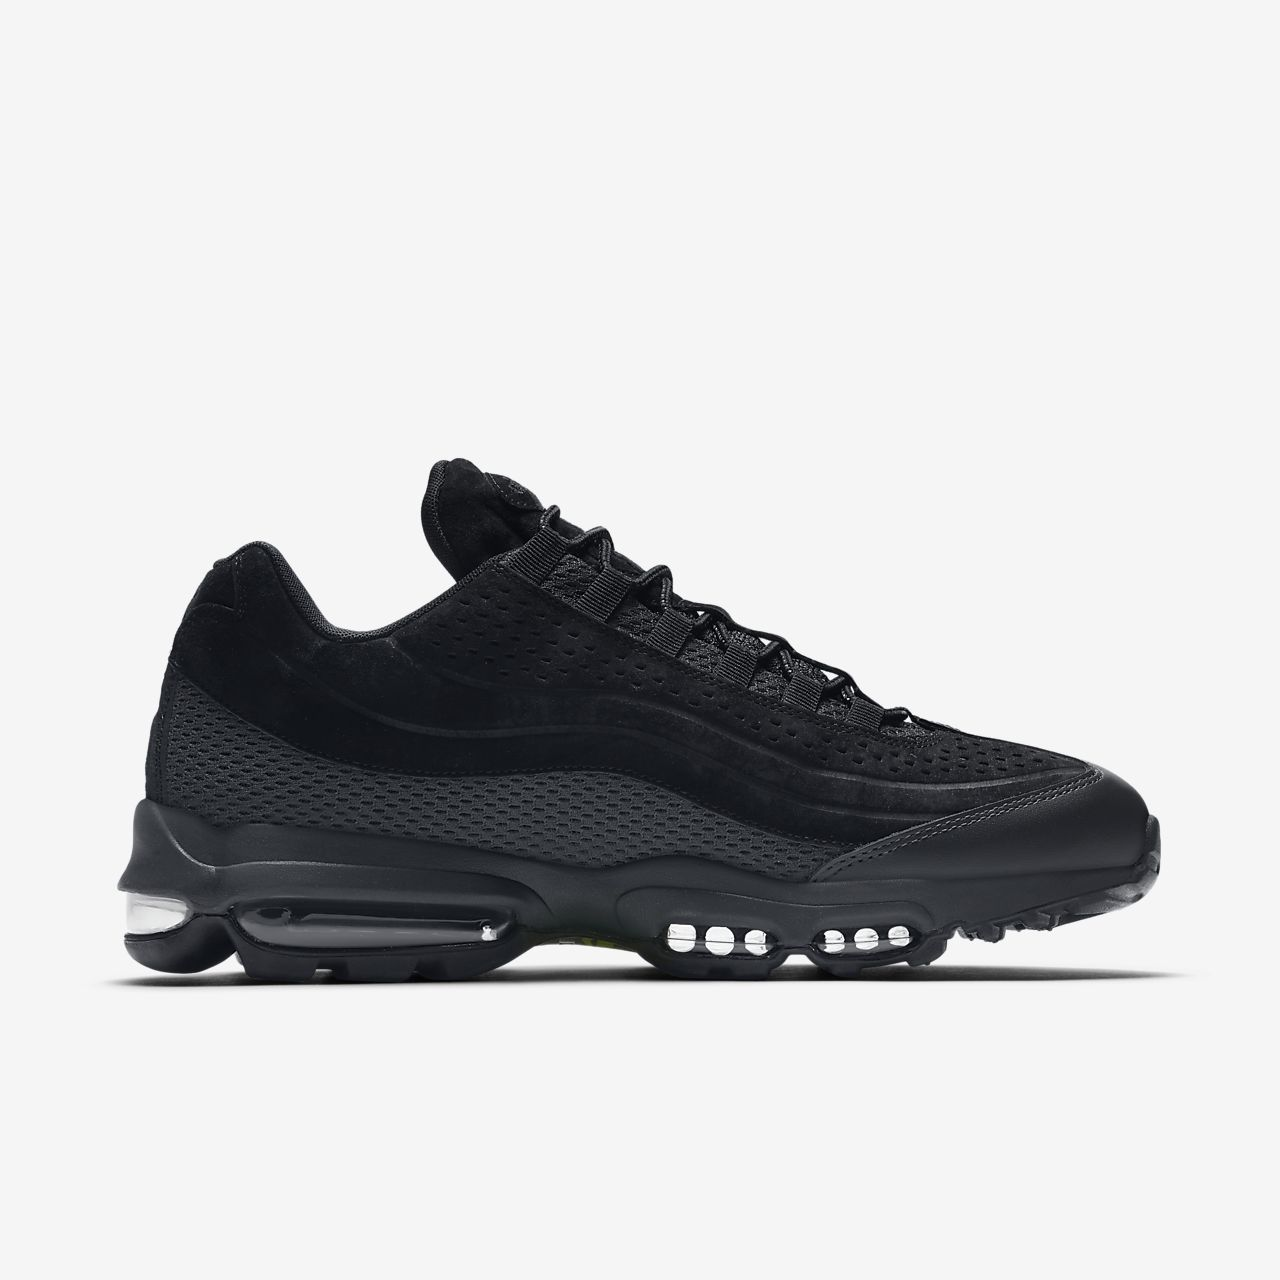 low priced c4852 3042c ... Nike Air Max 95 Ultra Premium BR Men s Shoe